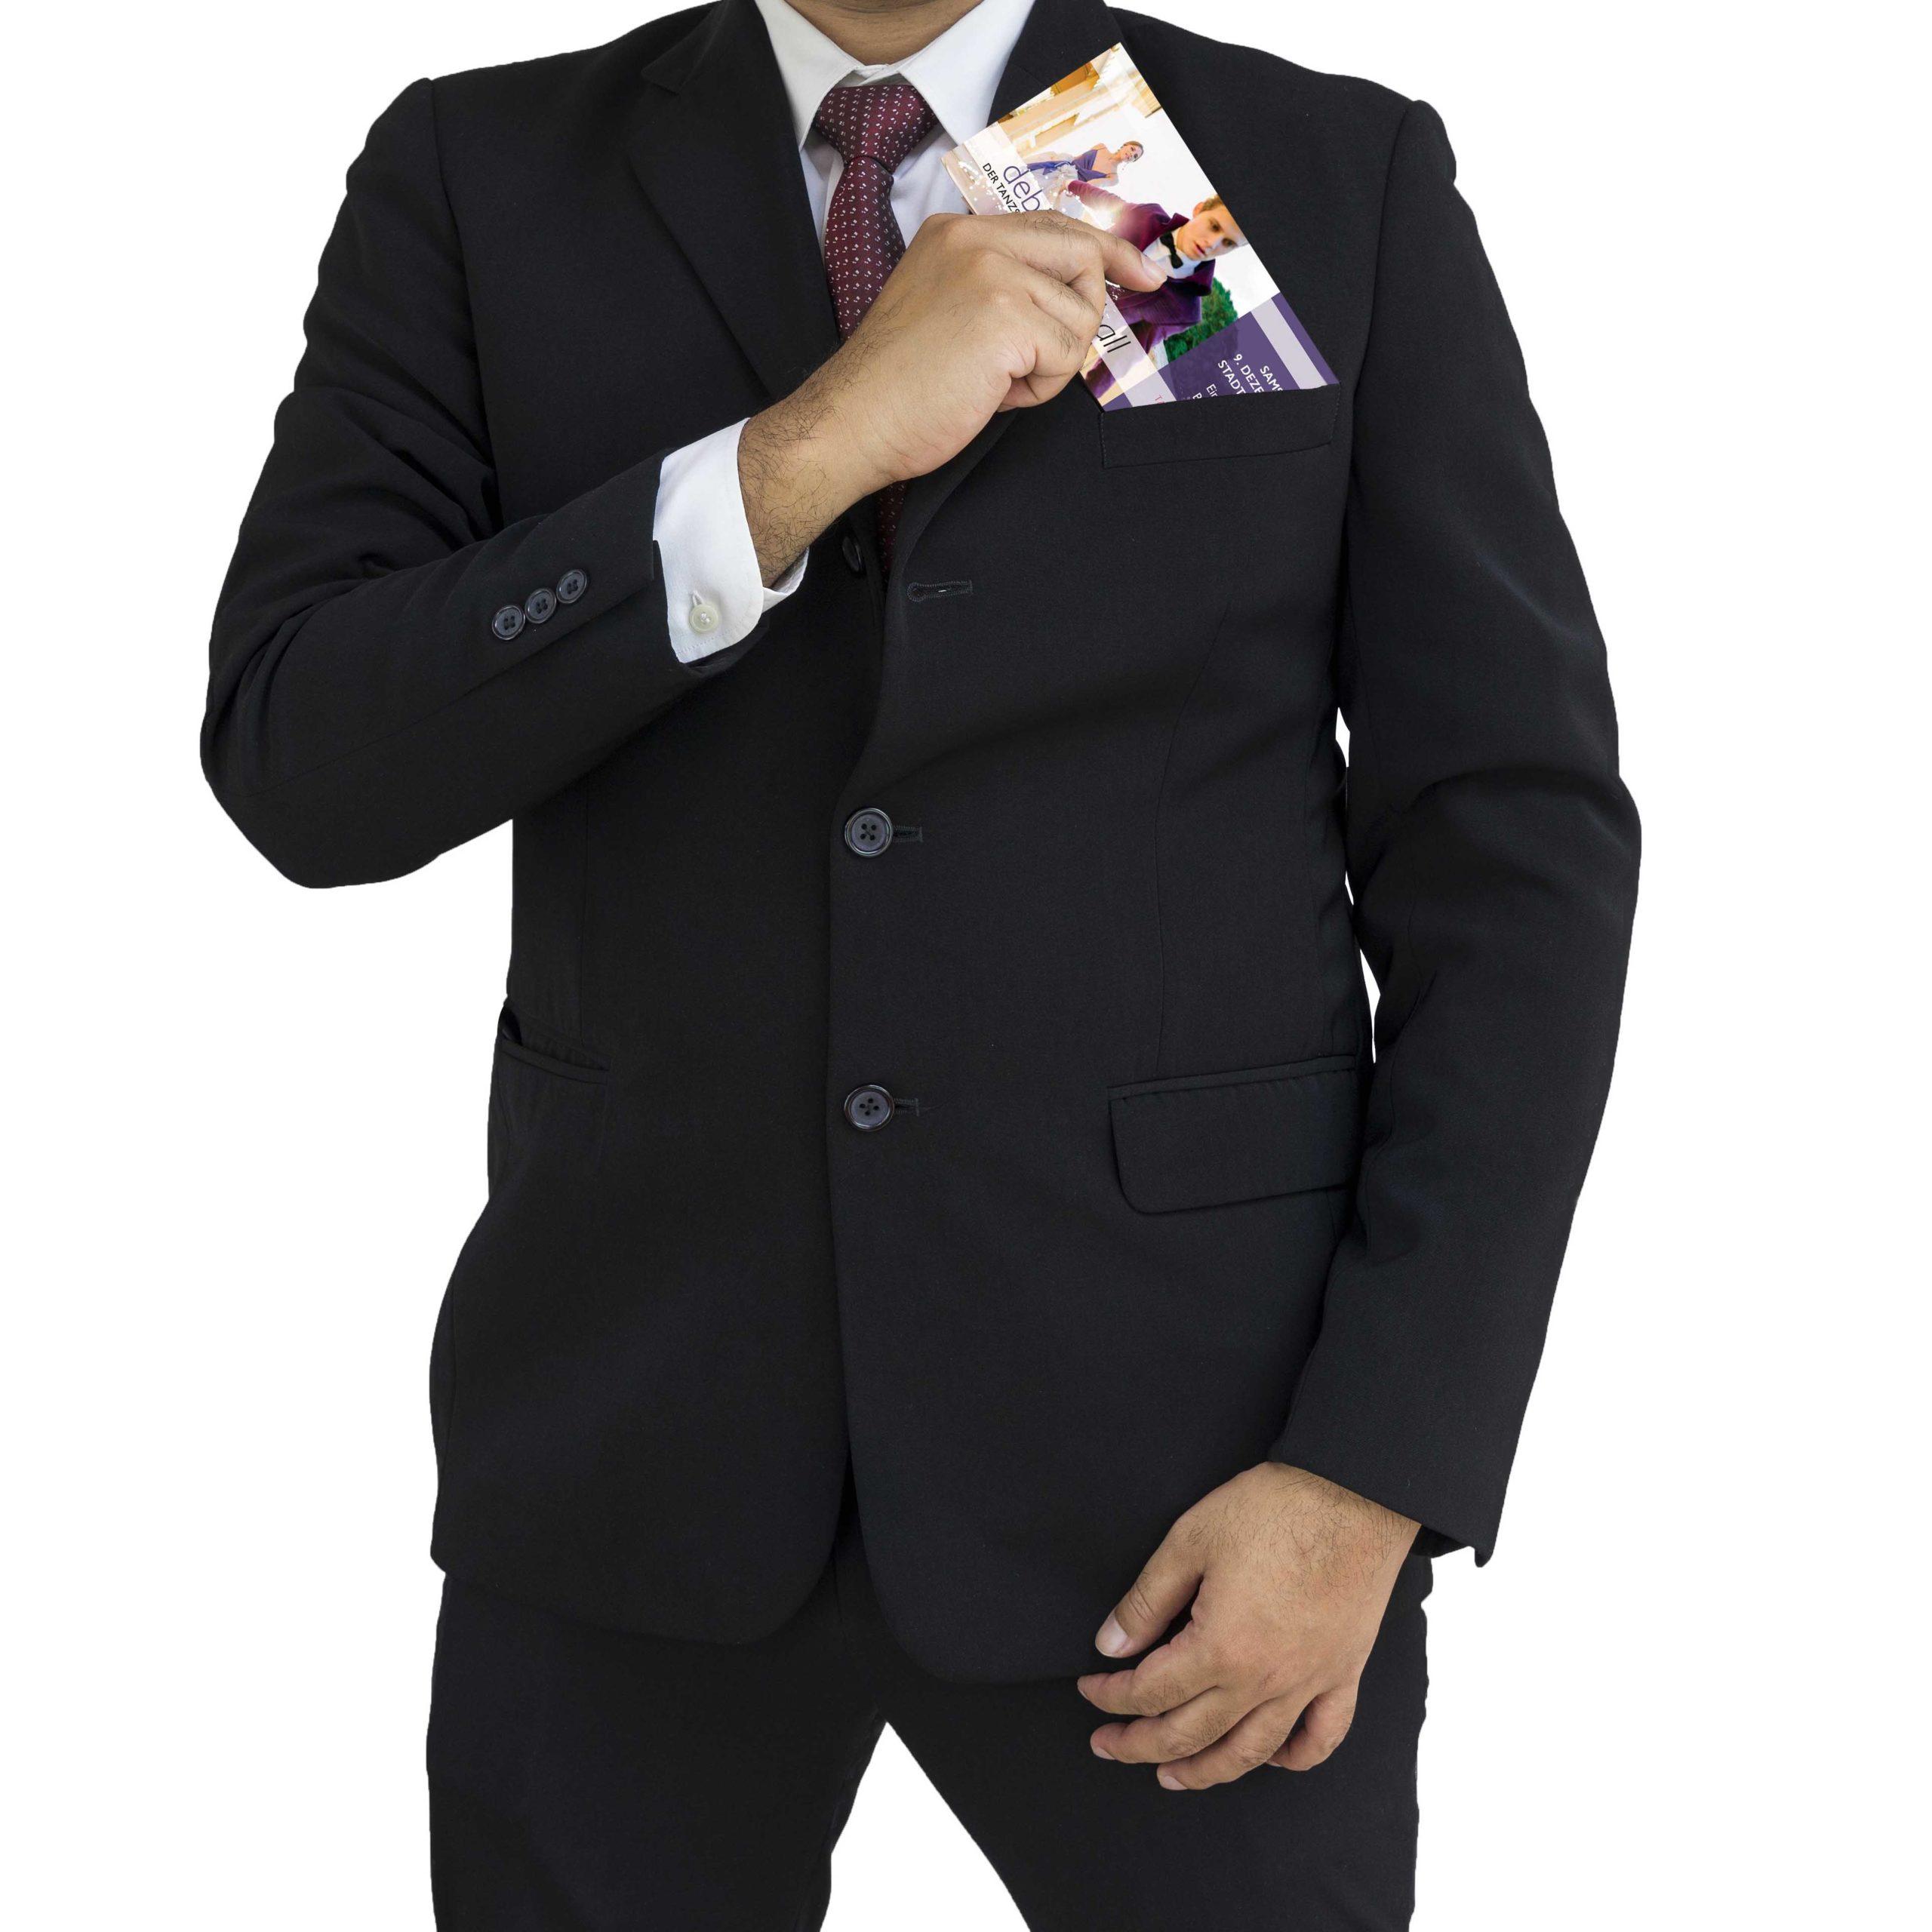 Ballkarte quadratisch scaled Kartenvorverkauf Debütantenbälle